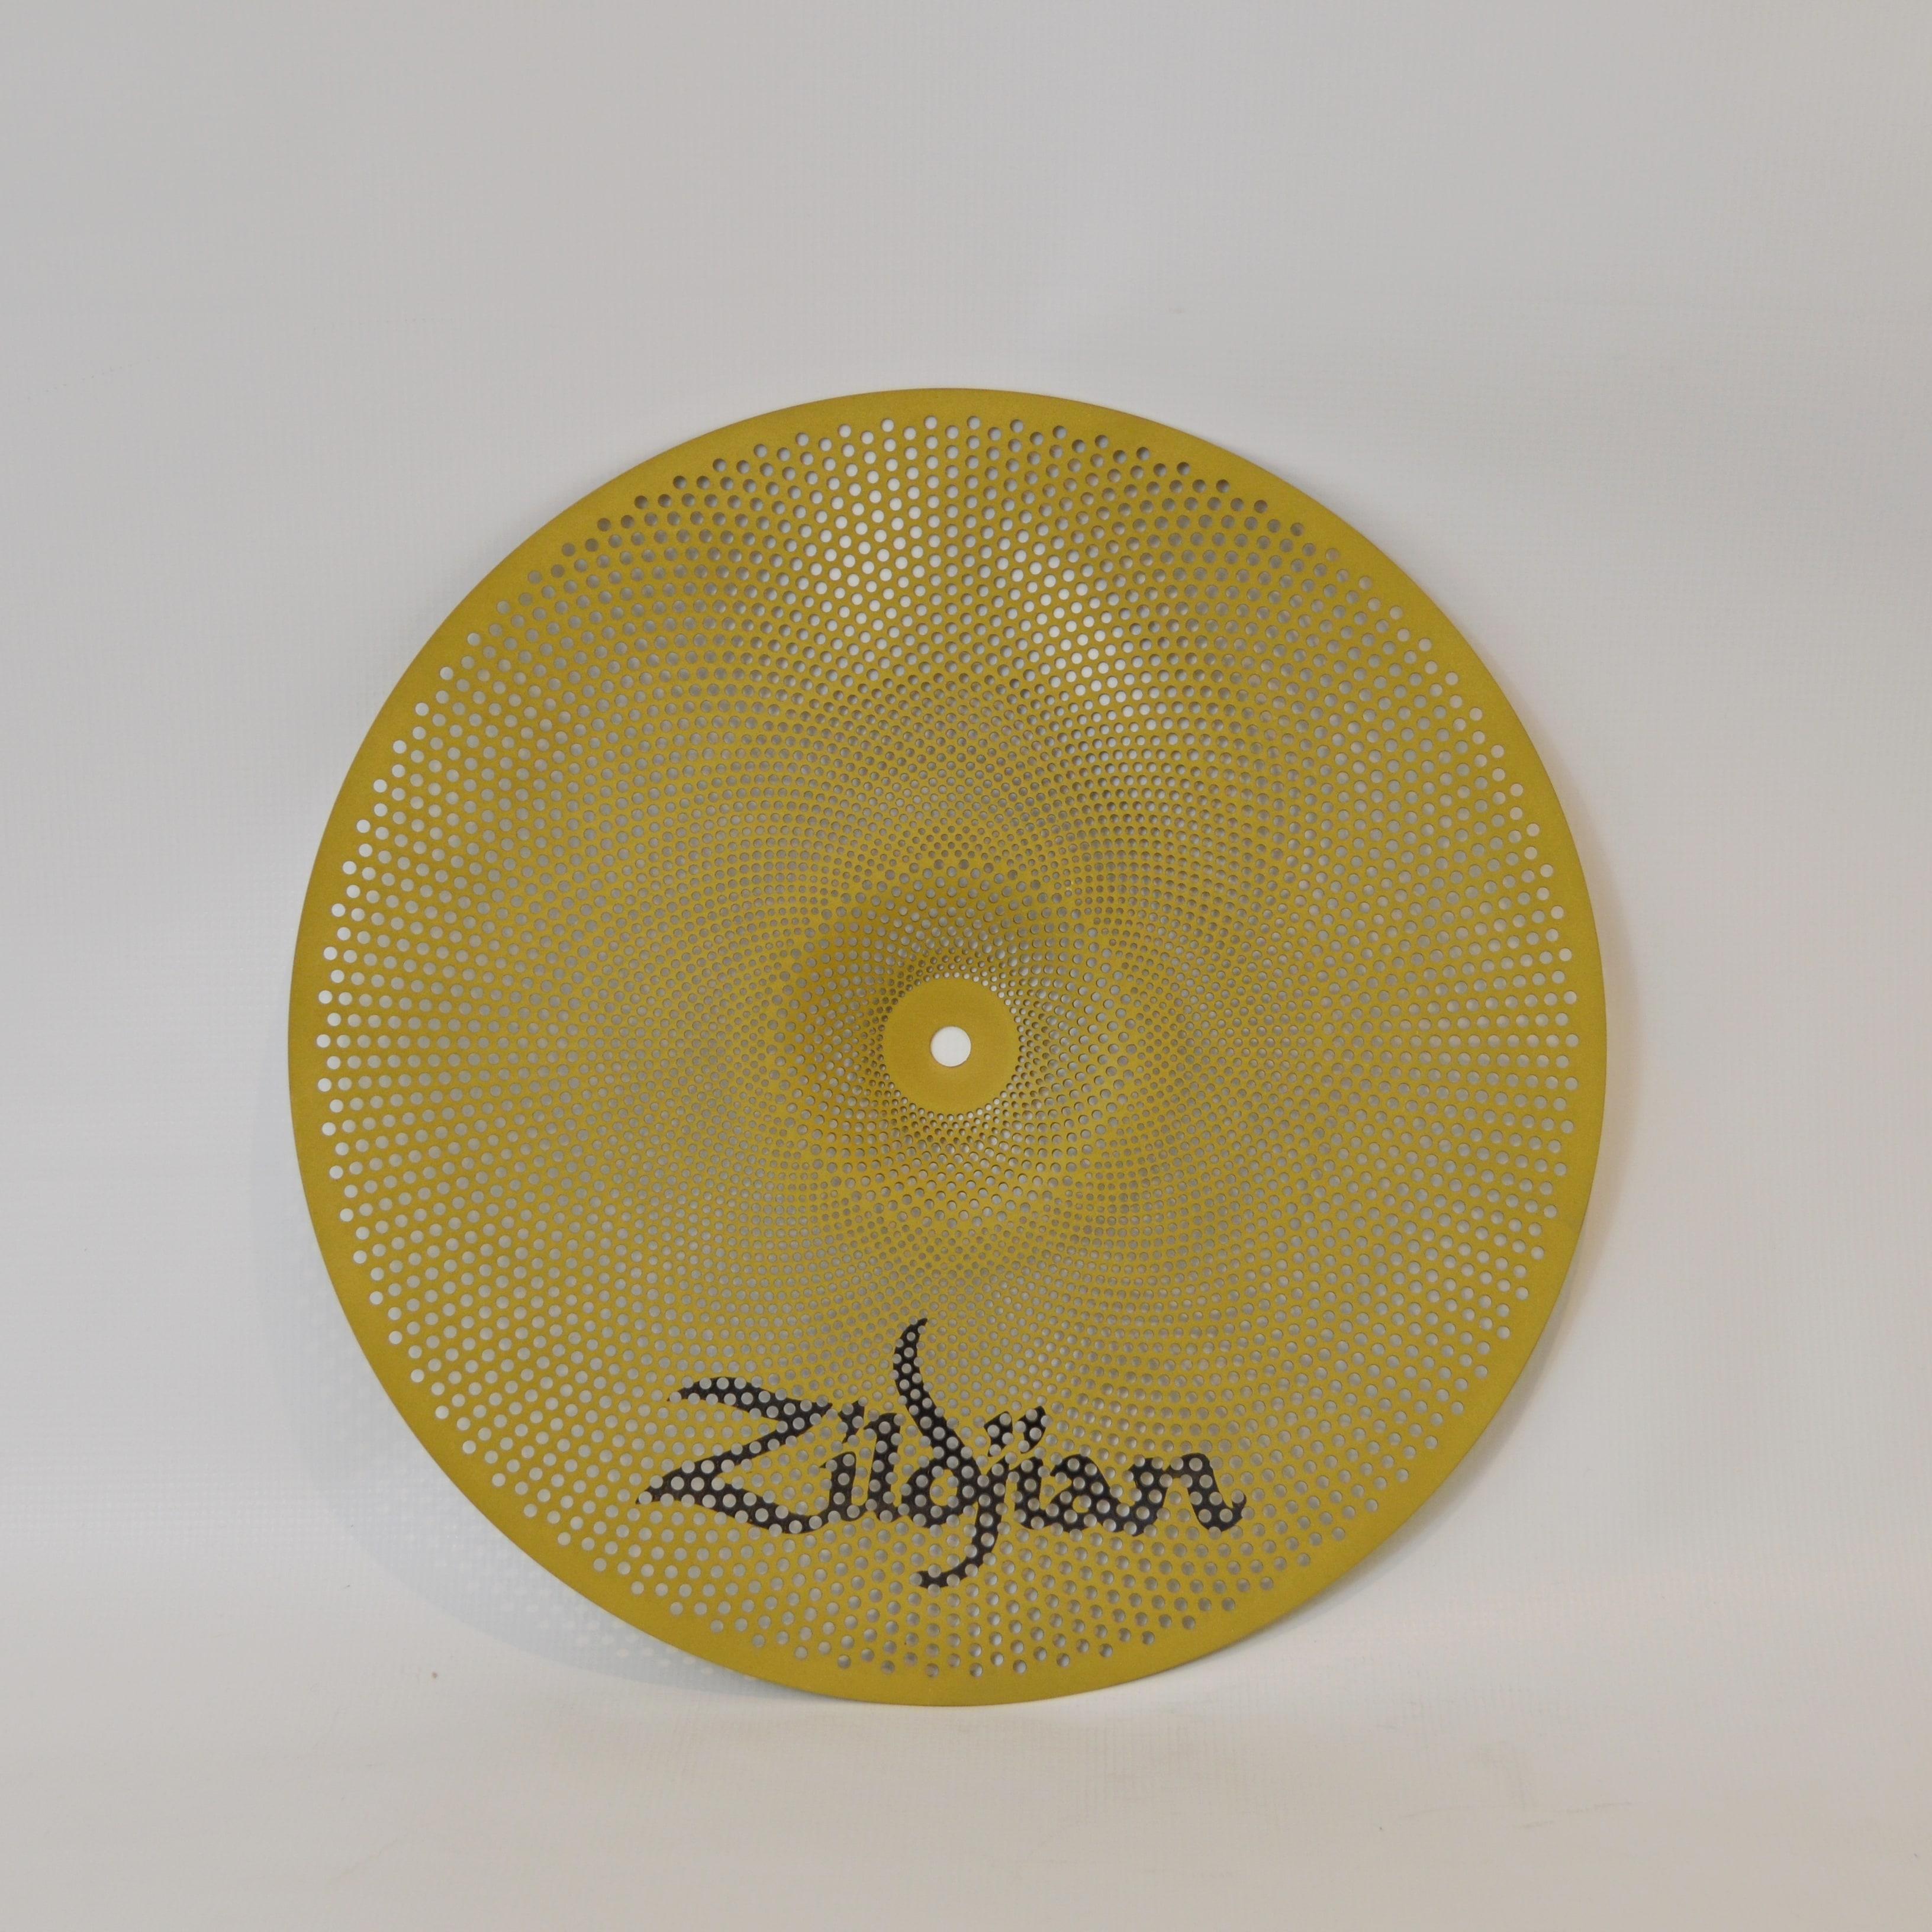 beatit test zildjian l80 low volume cymbals. Black Bedroom Furniture Sets. Home Design Ideas